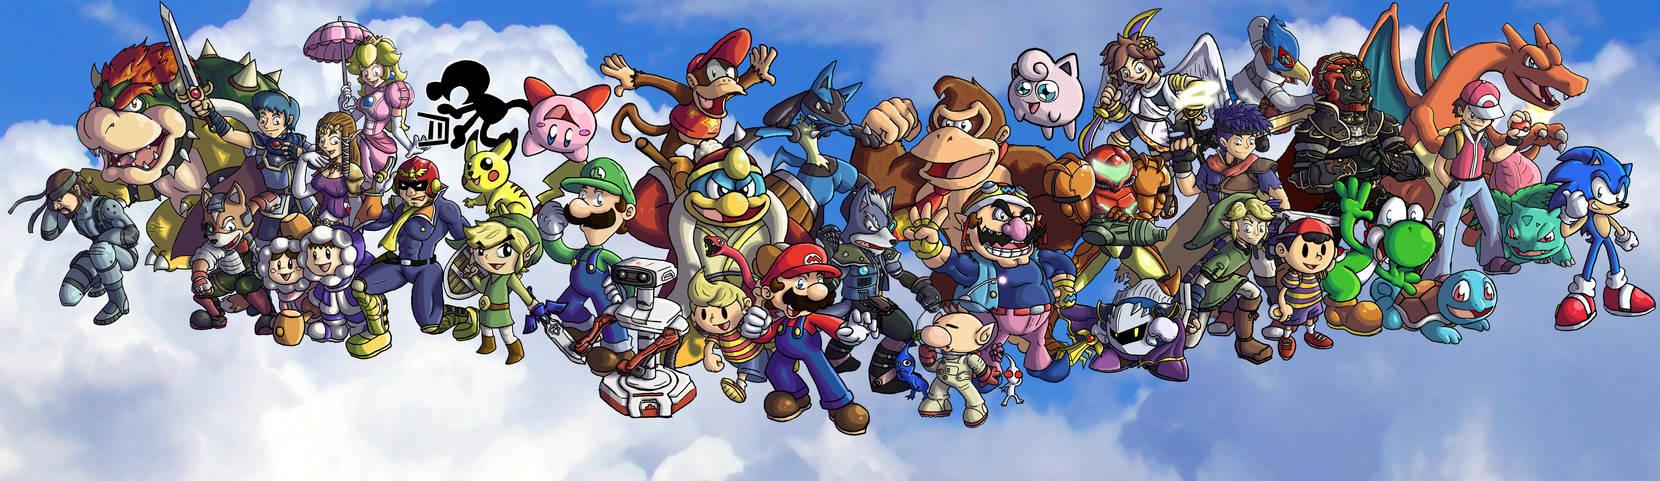 Super Smash Bros. Brawl-OLD- by ChetRippo